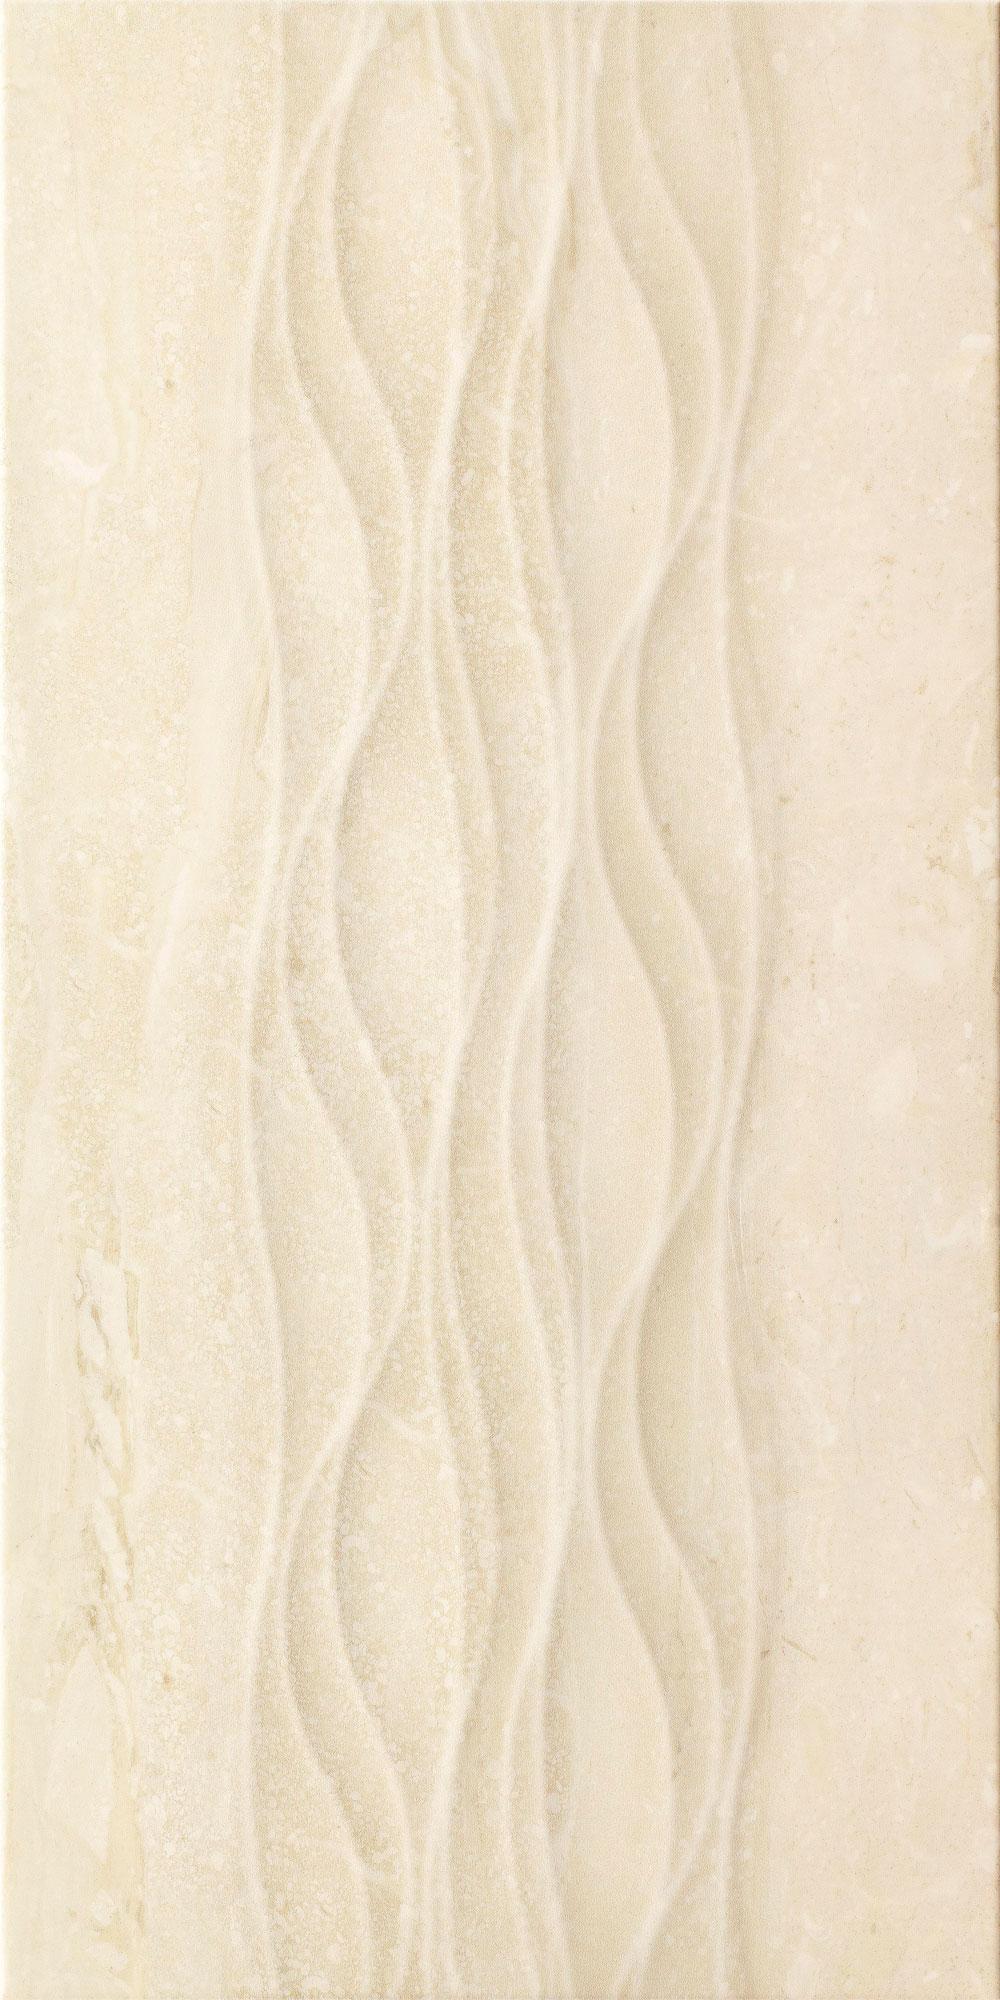 Настенная плитка Ceramika Paradyz Coraline Beige struktura 30x60 (0,90) настенная плитка azteca elite rock beige 30x60